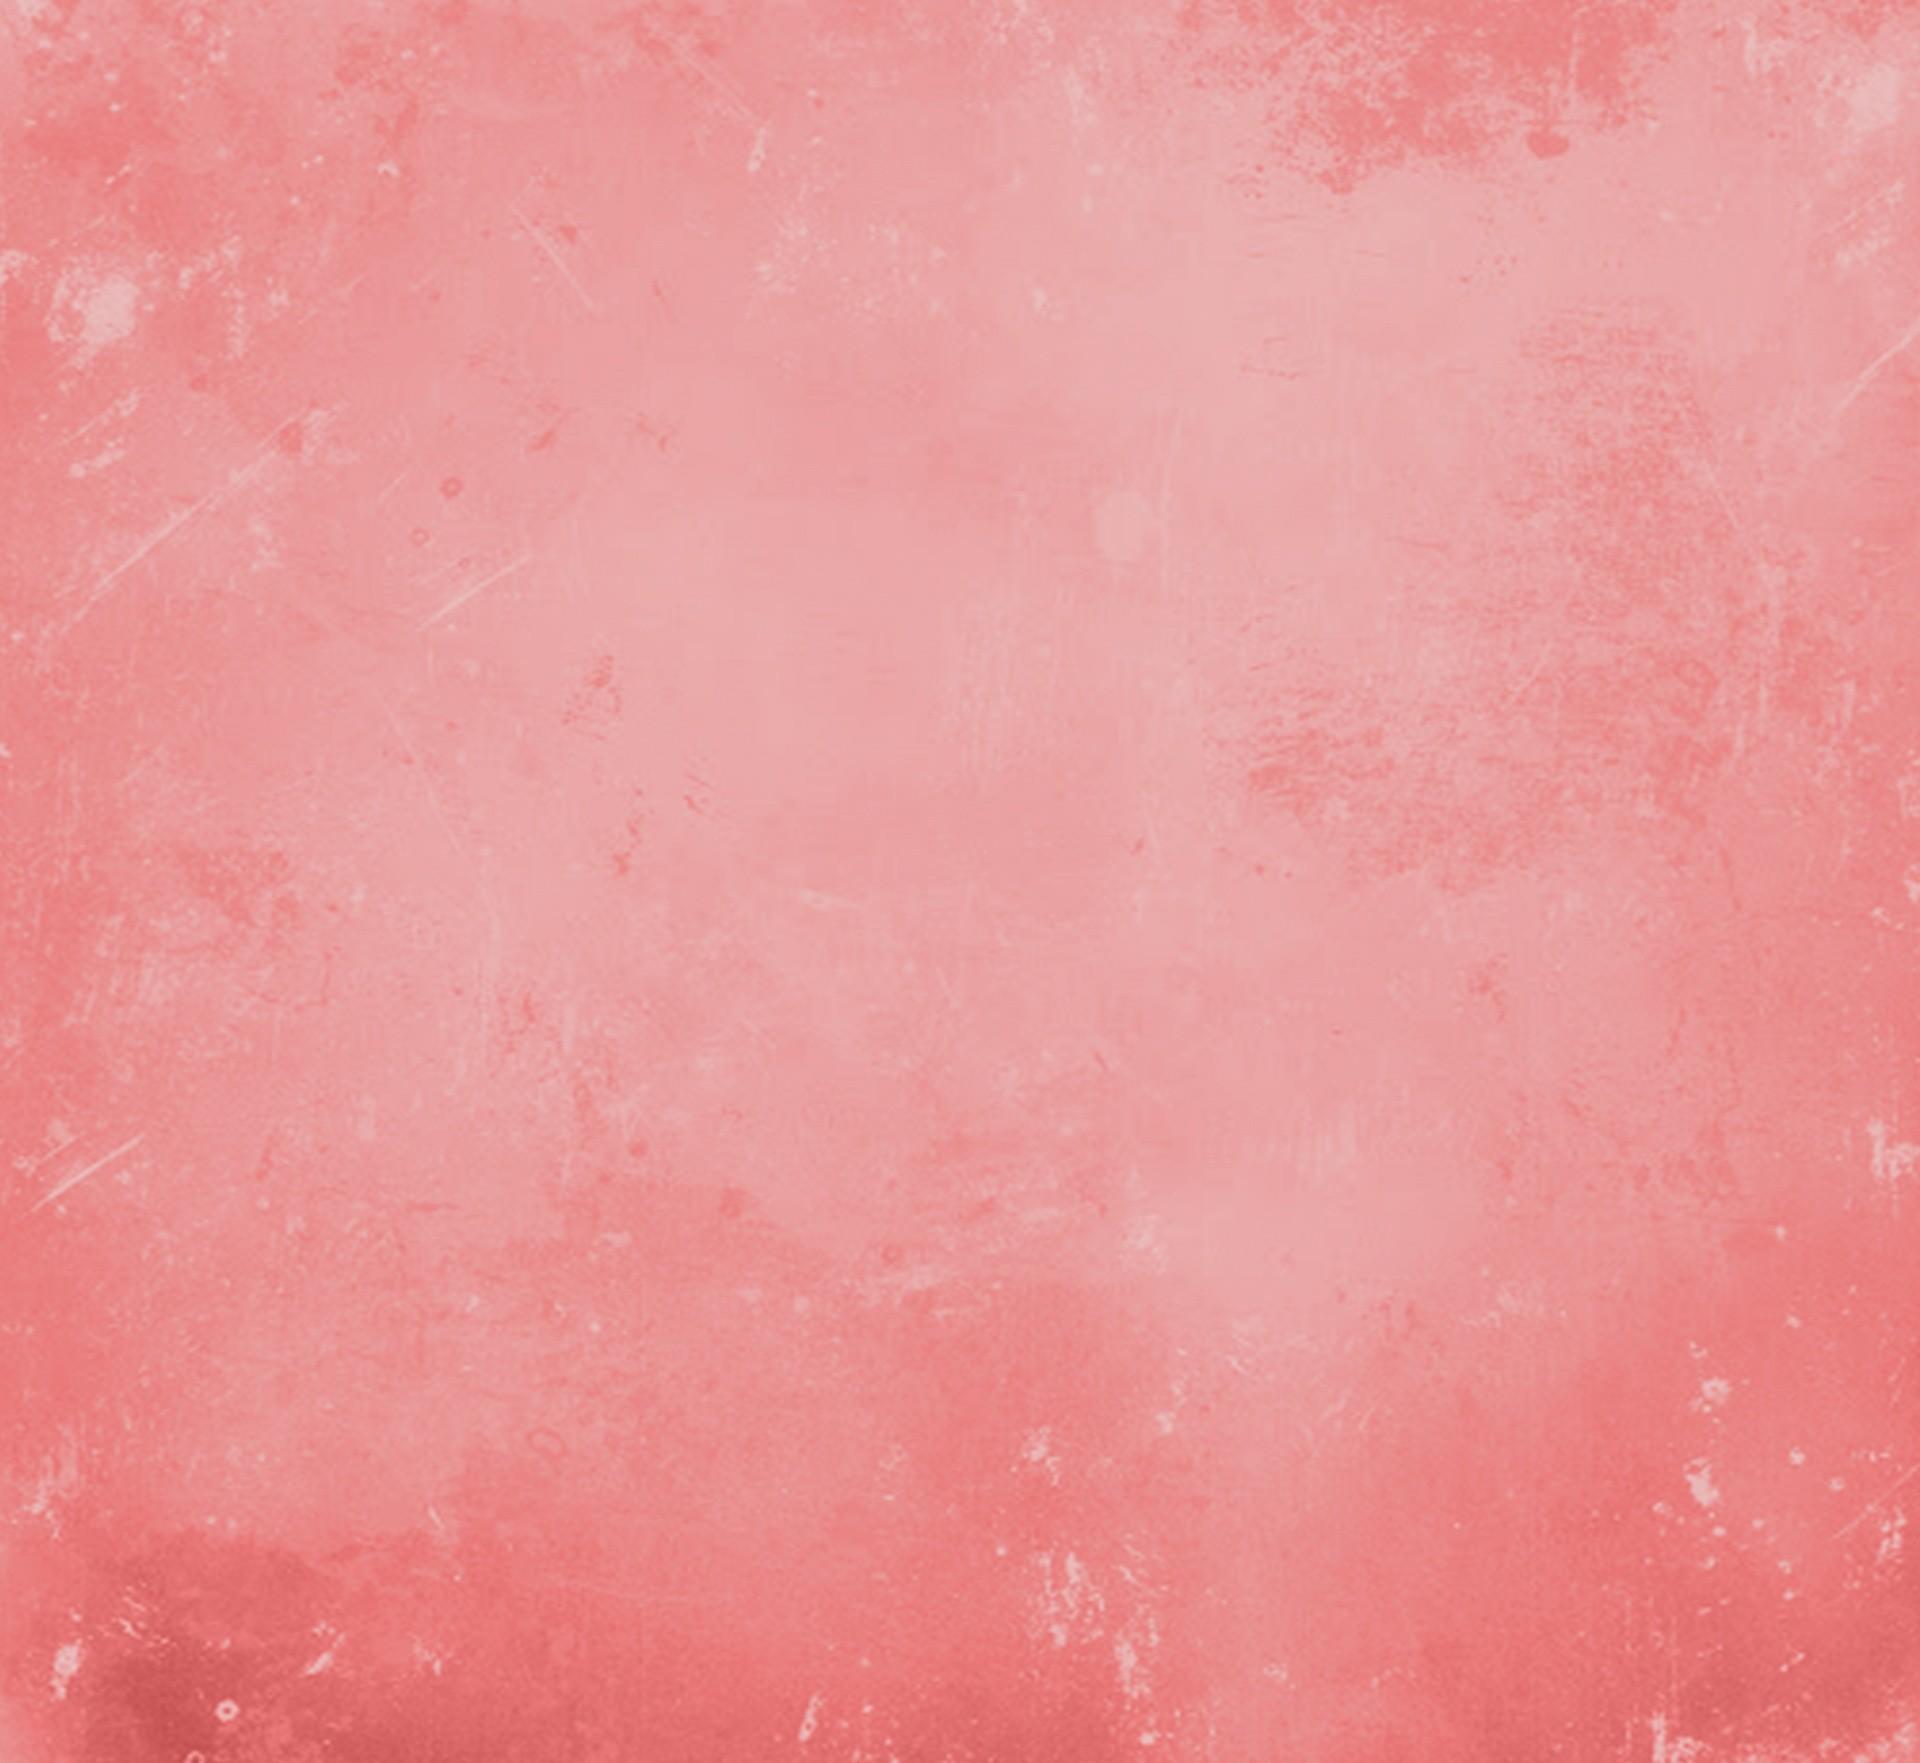 Background Grunge Wallpaper Pink